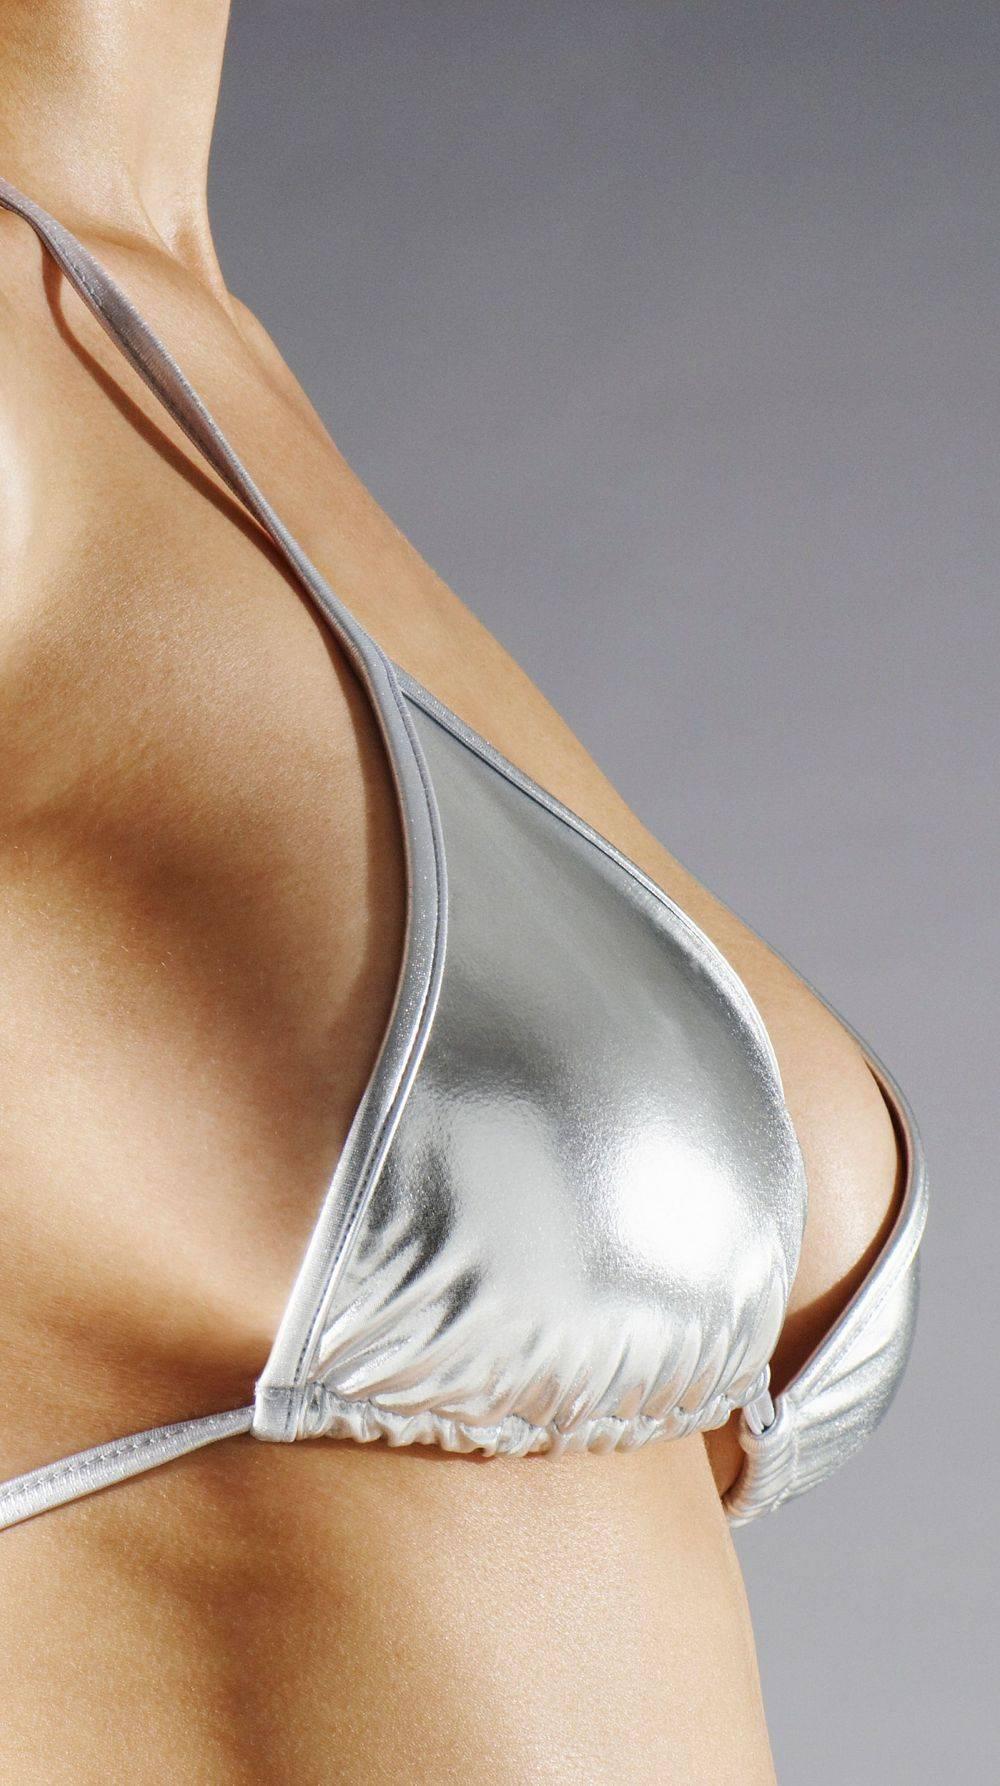 Breast Surgery, Breast Augmentation